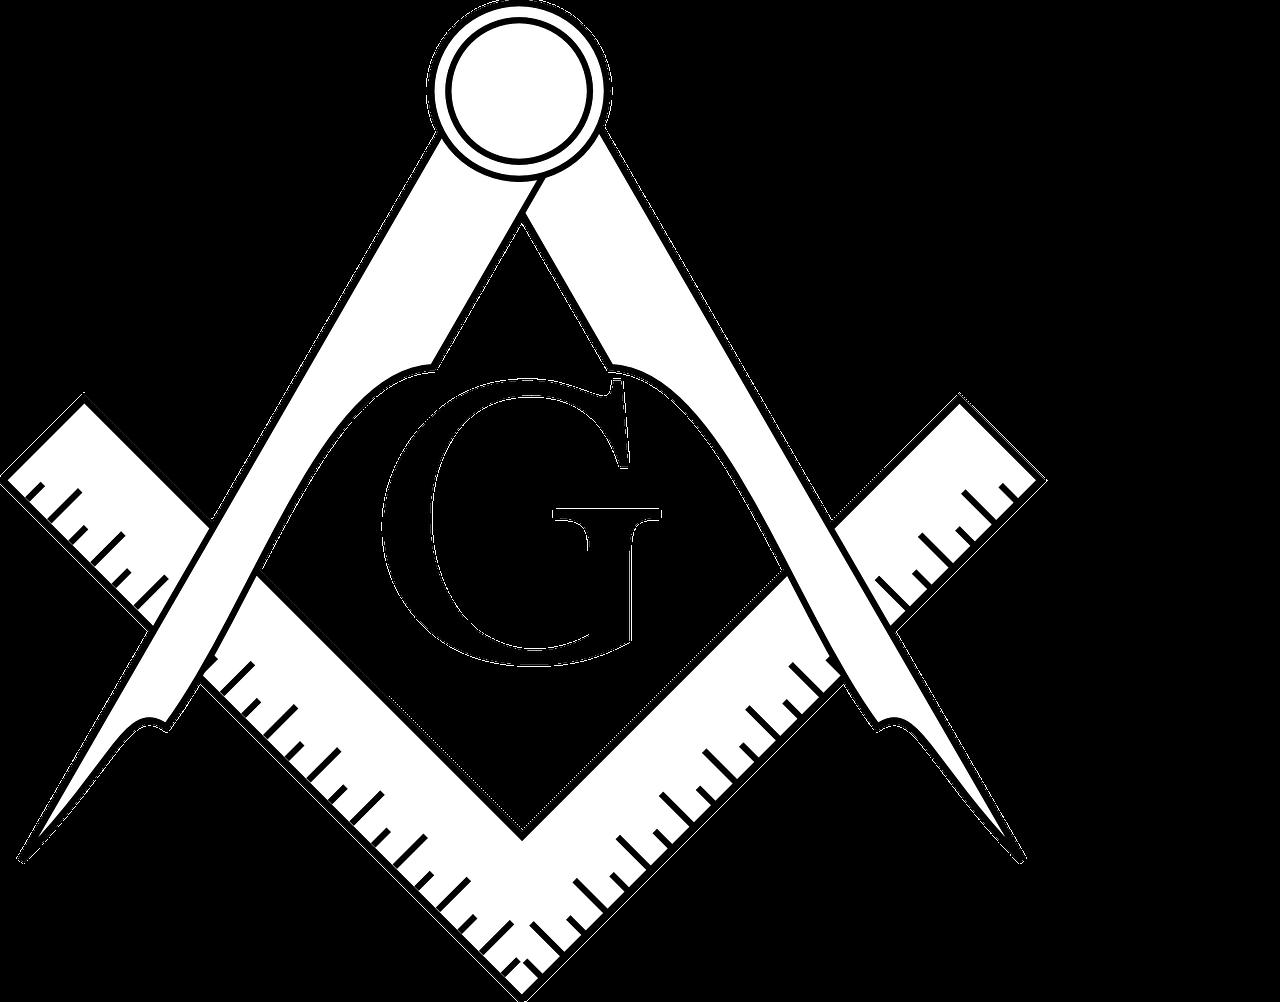 Tarot De Sula Escuadra Y Compas Simbolo Mason